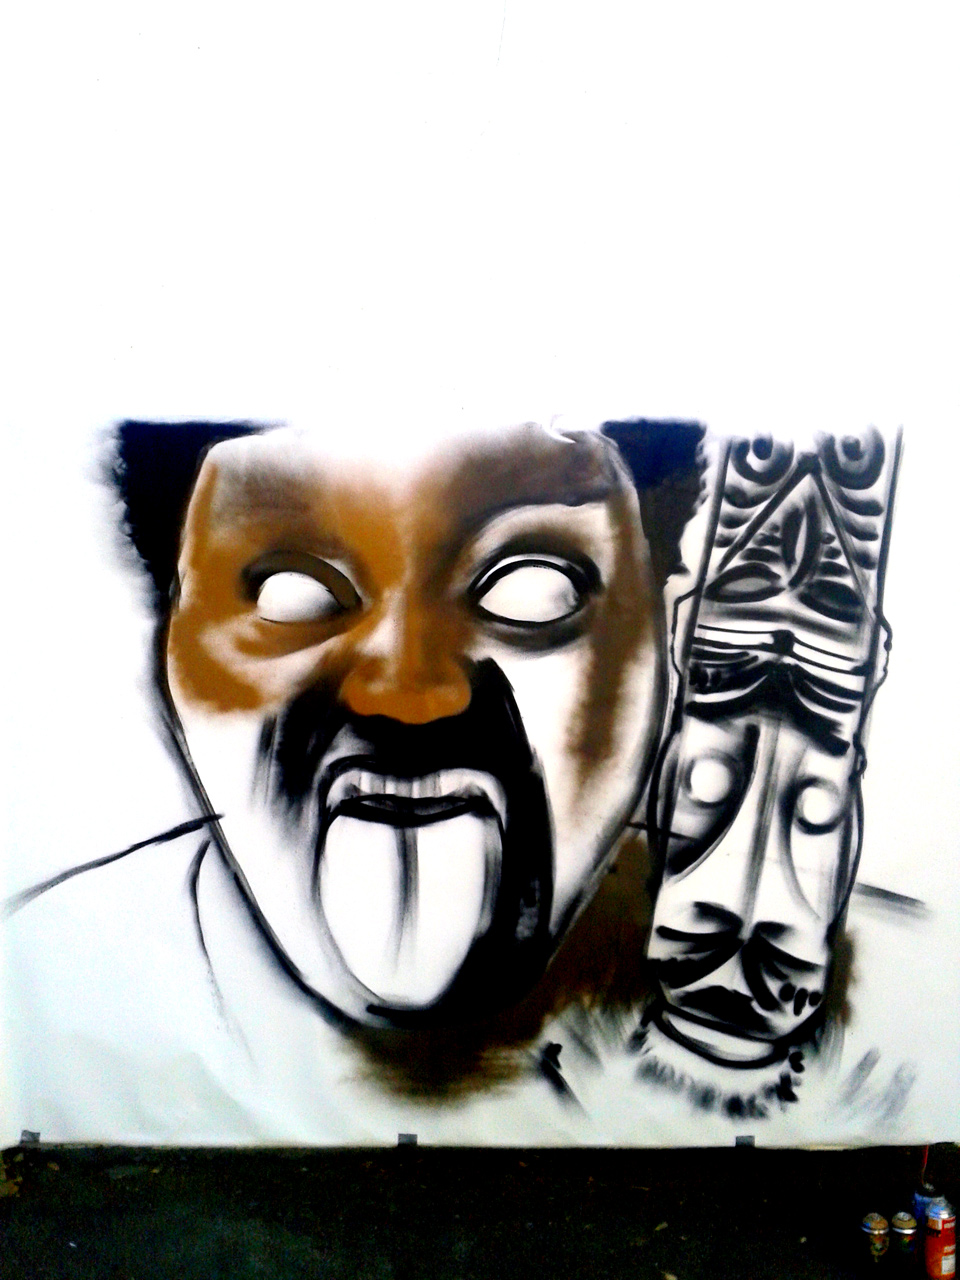 Performance graffiti